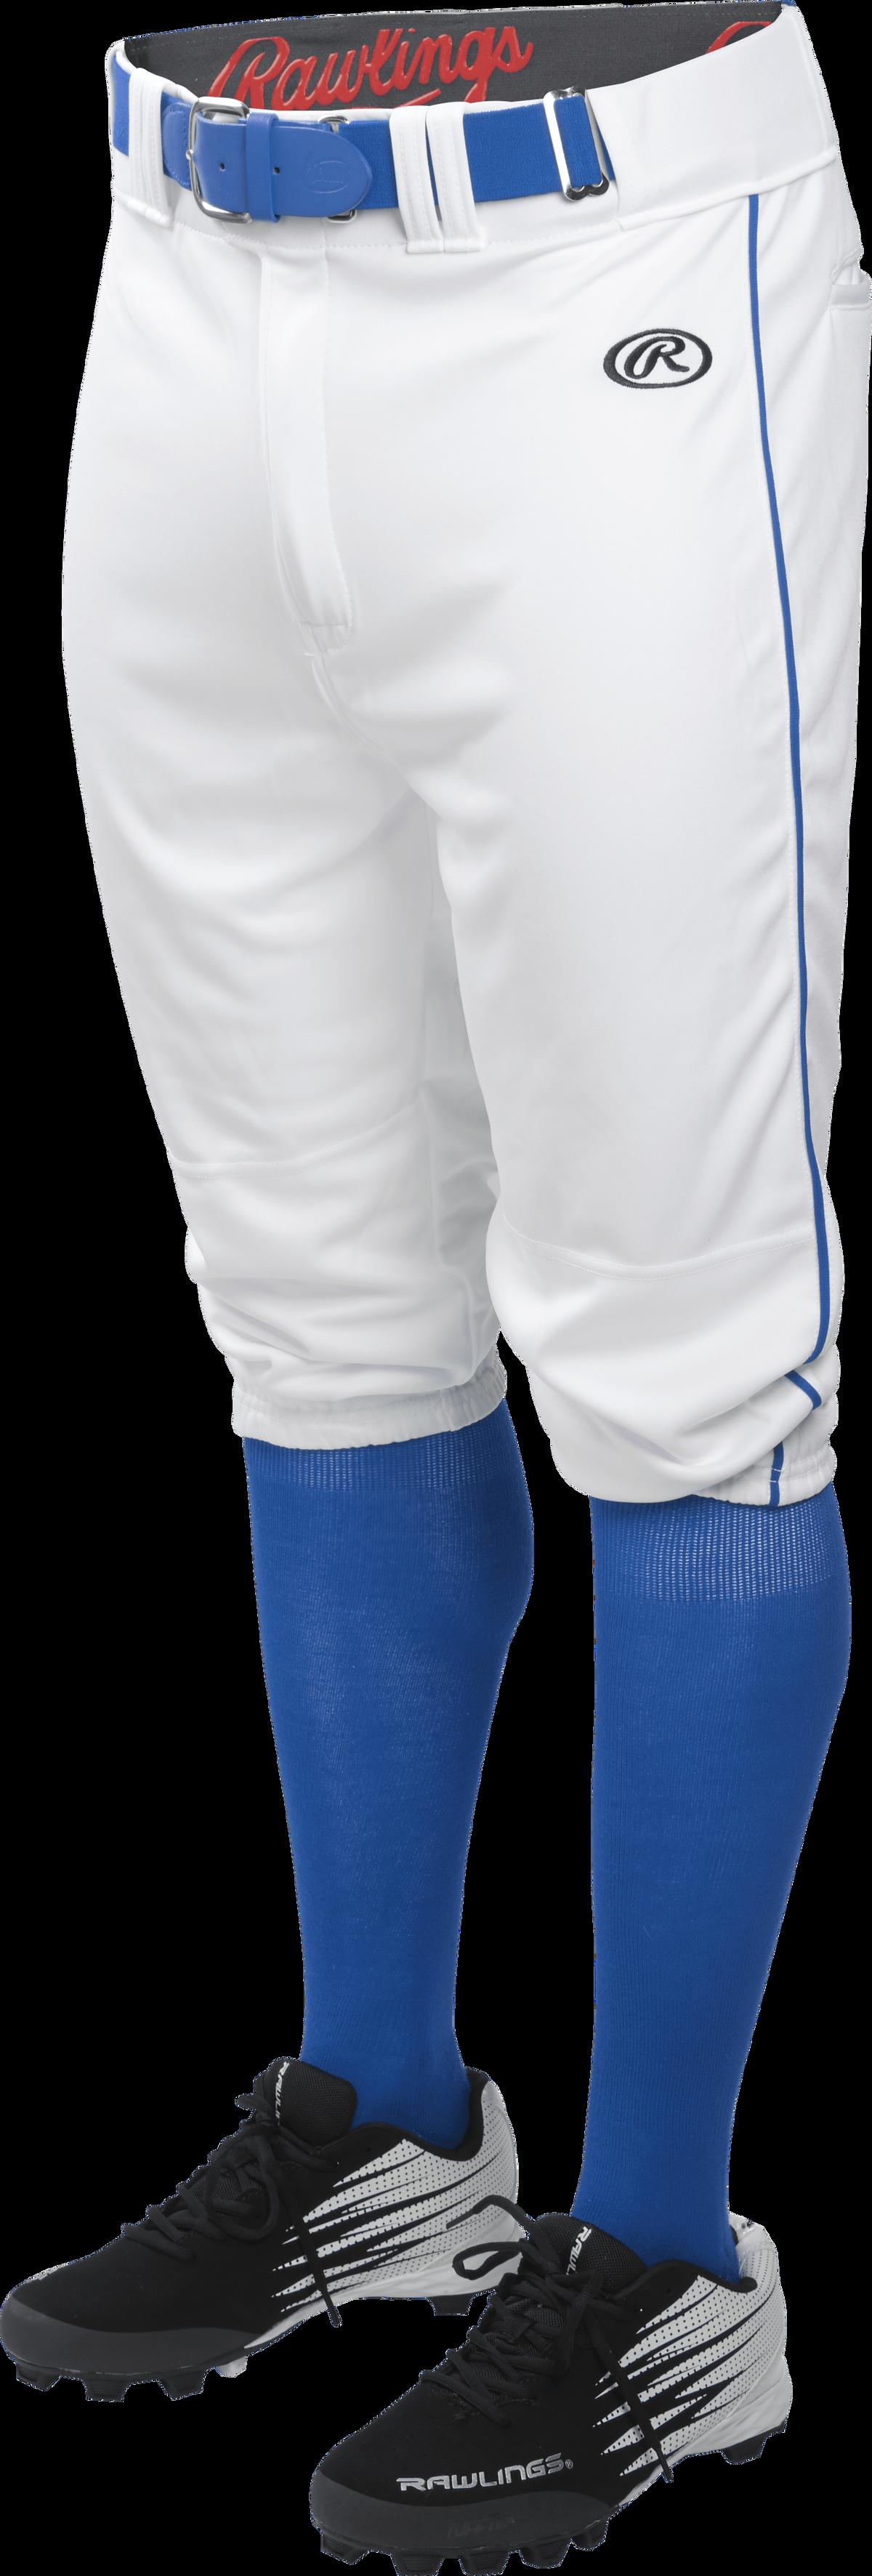 Rawlings Men/'s Launch Knicker Piped Baseball Pant